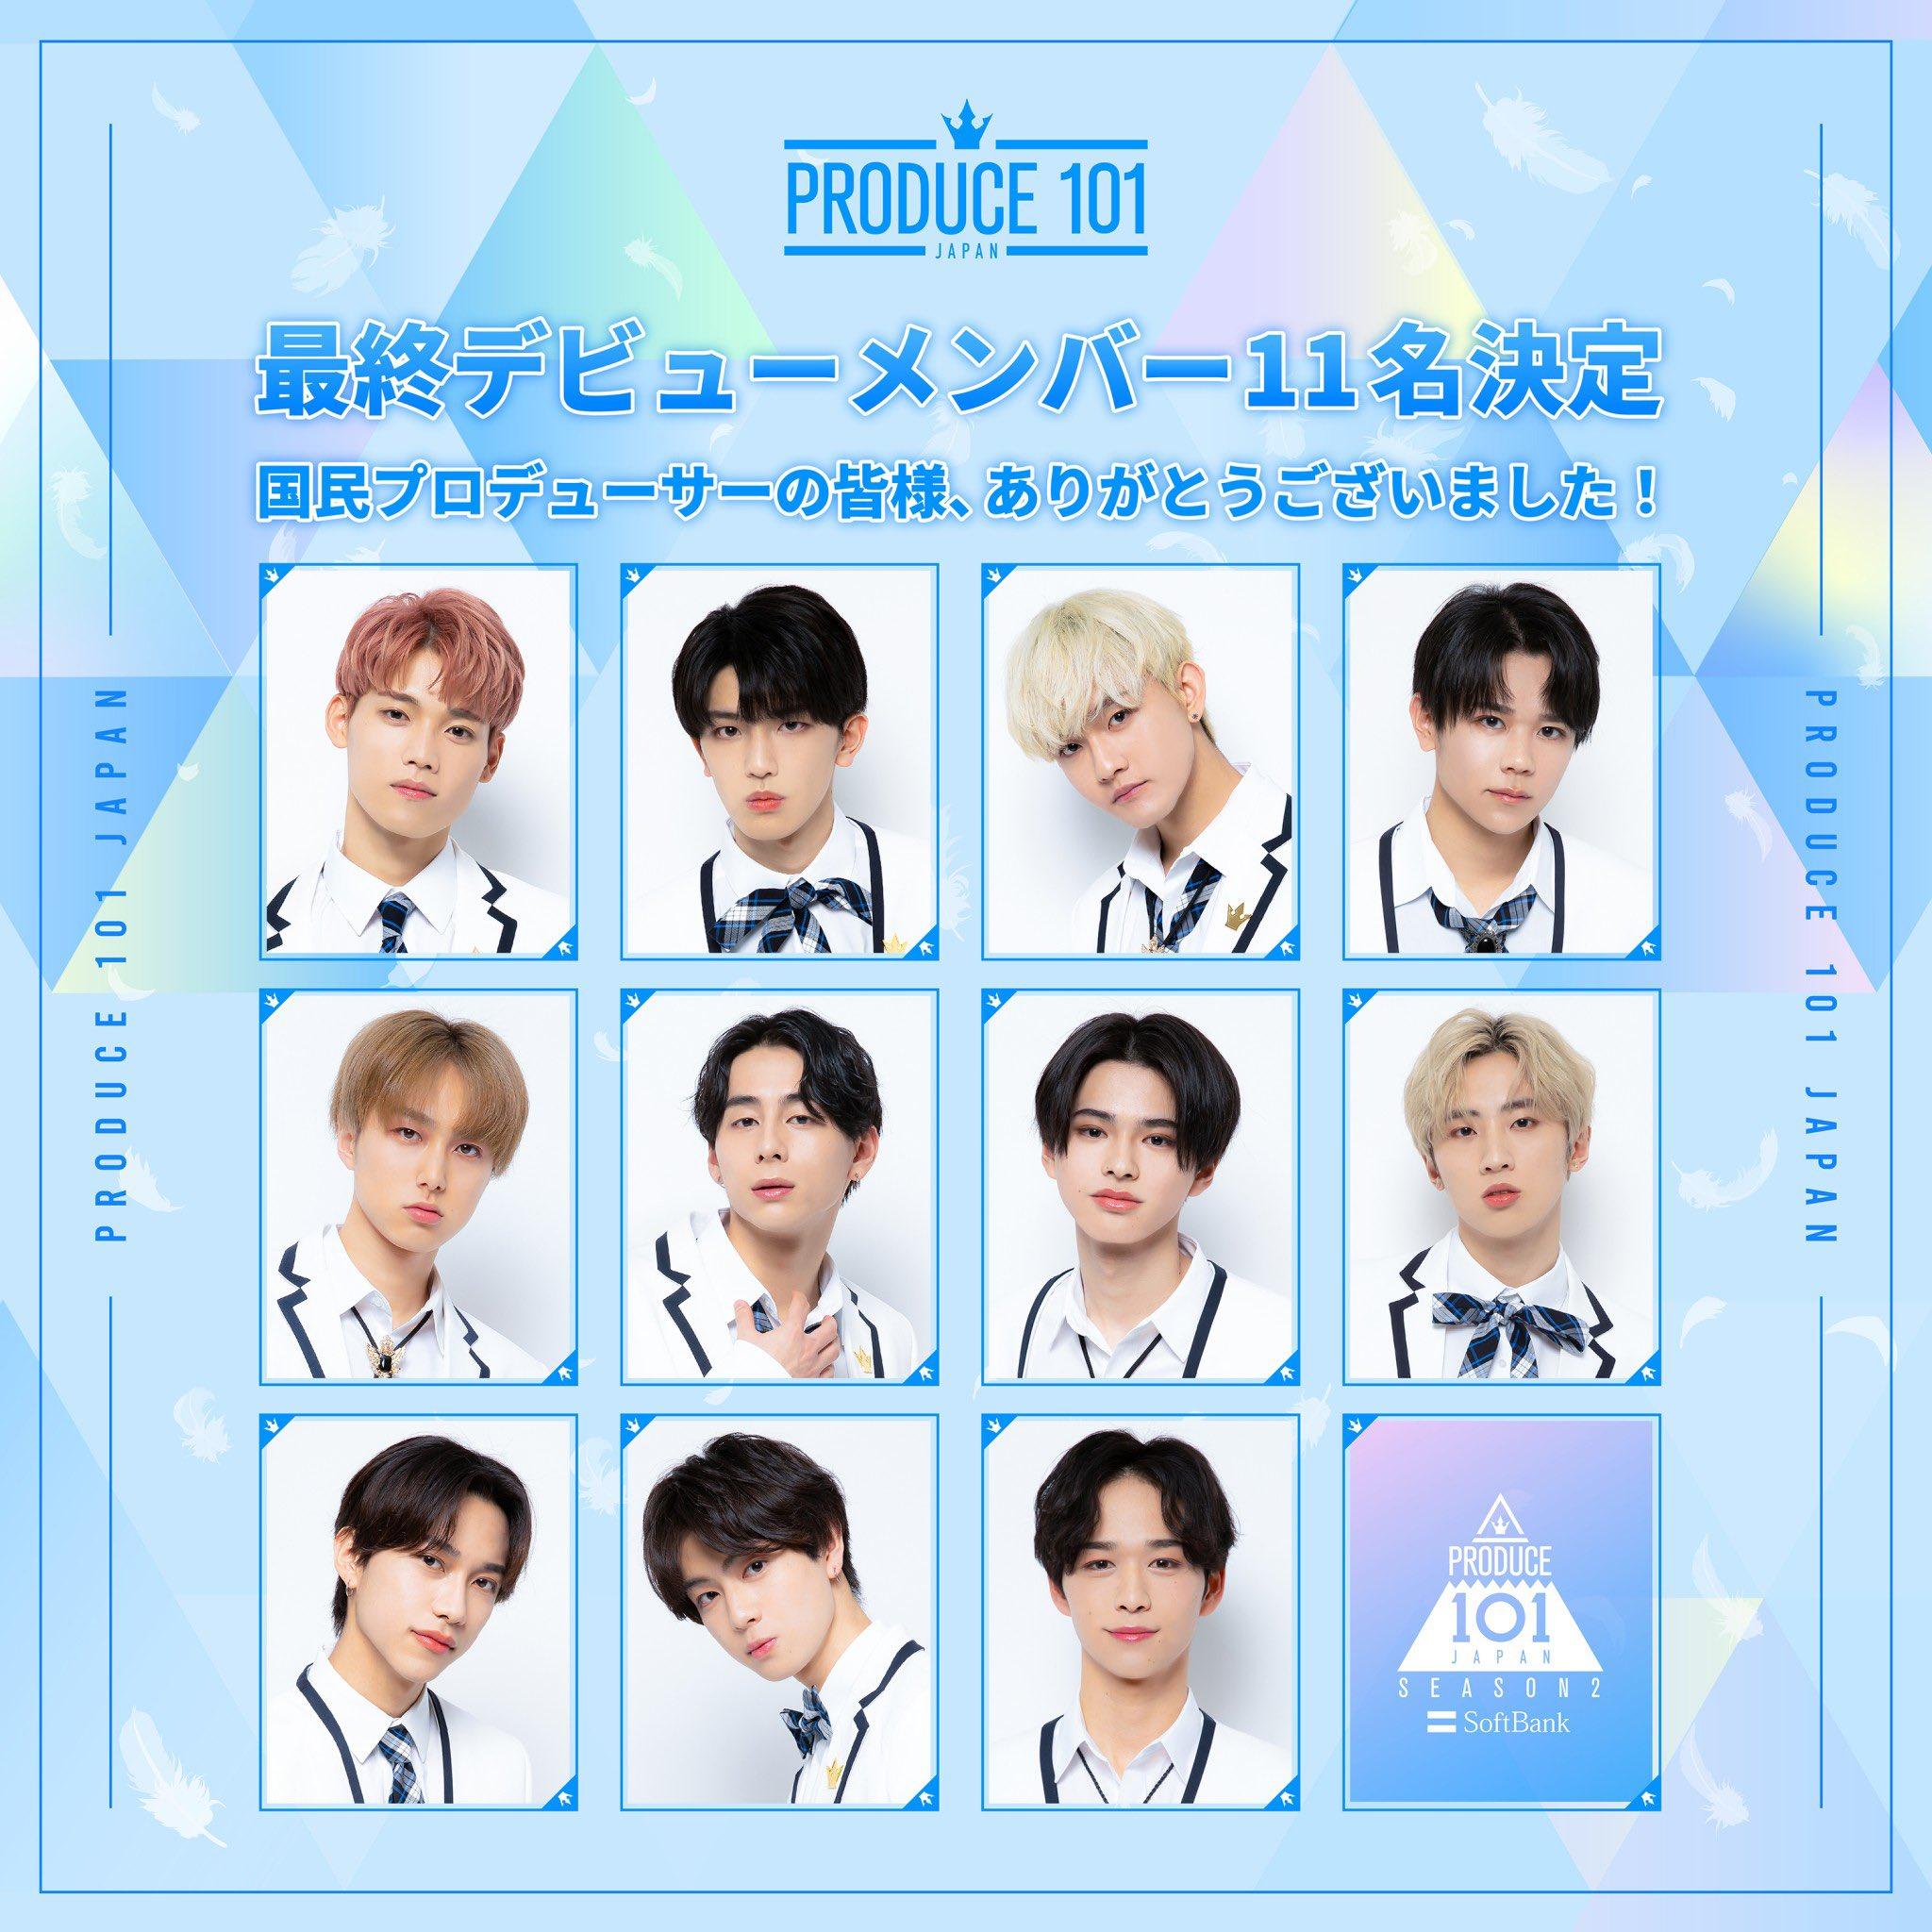 INIのメンバープロフィールをご紹介!『PRODUCE101 JAPAN SEASON2』からついにデビュー!